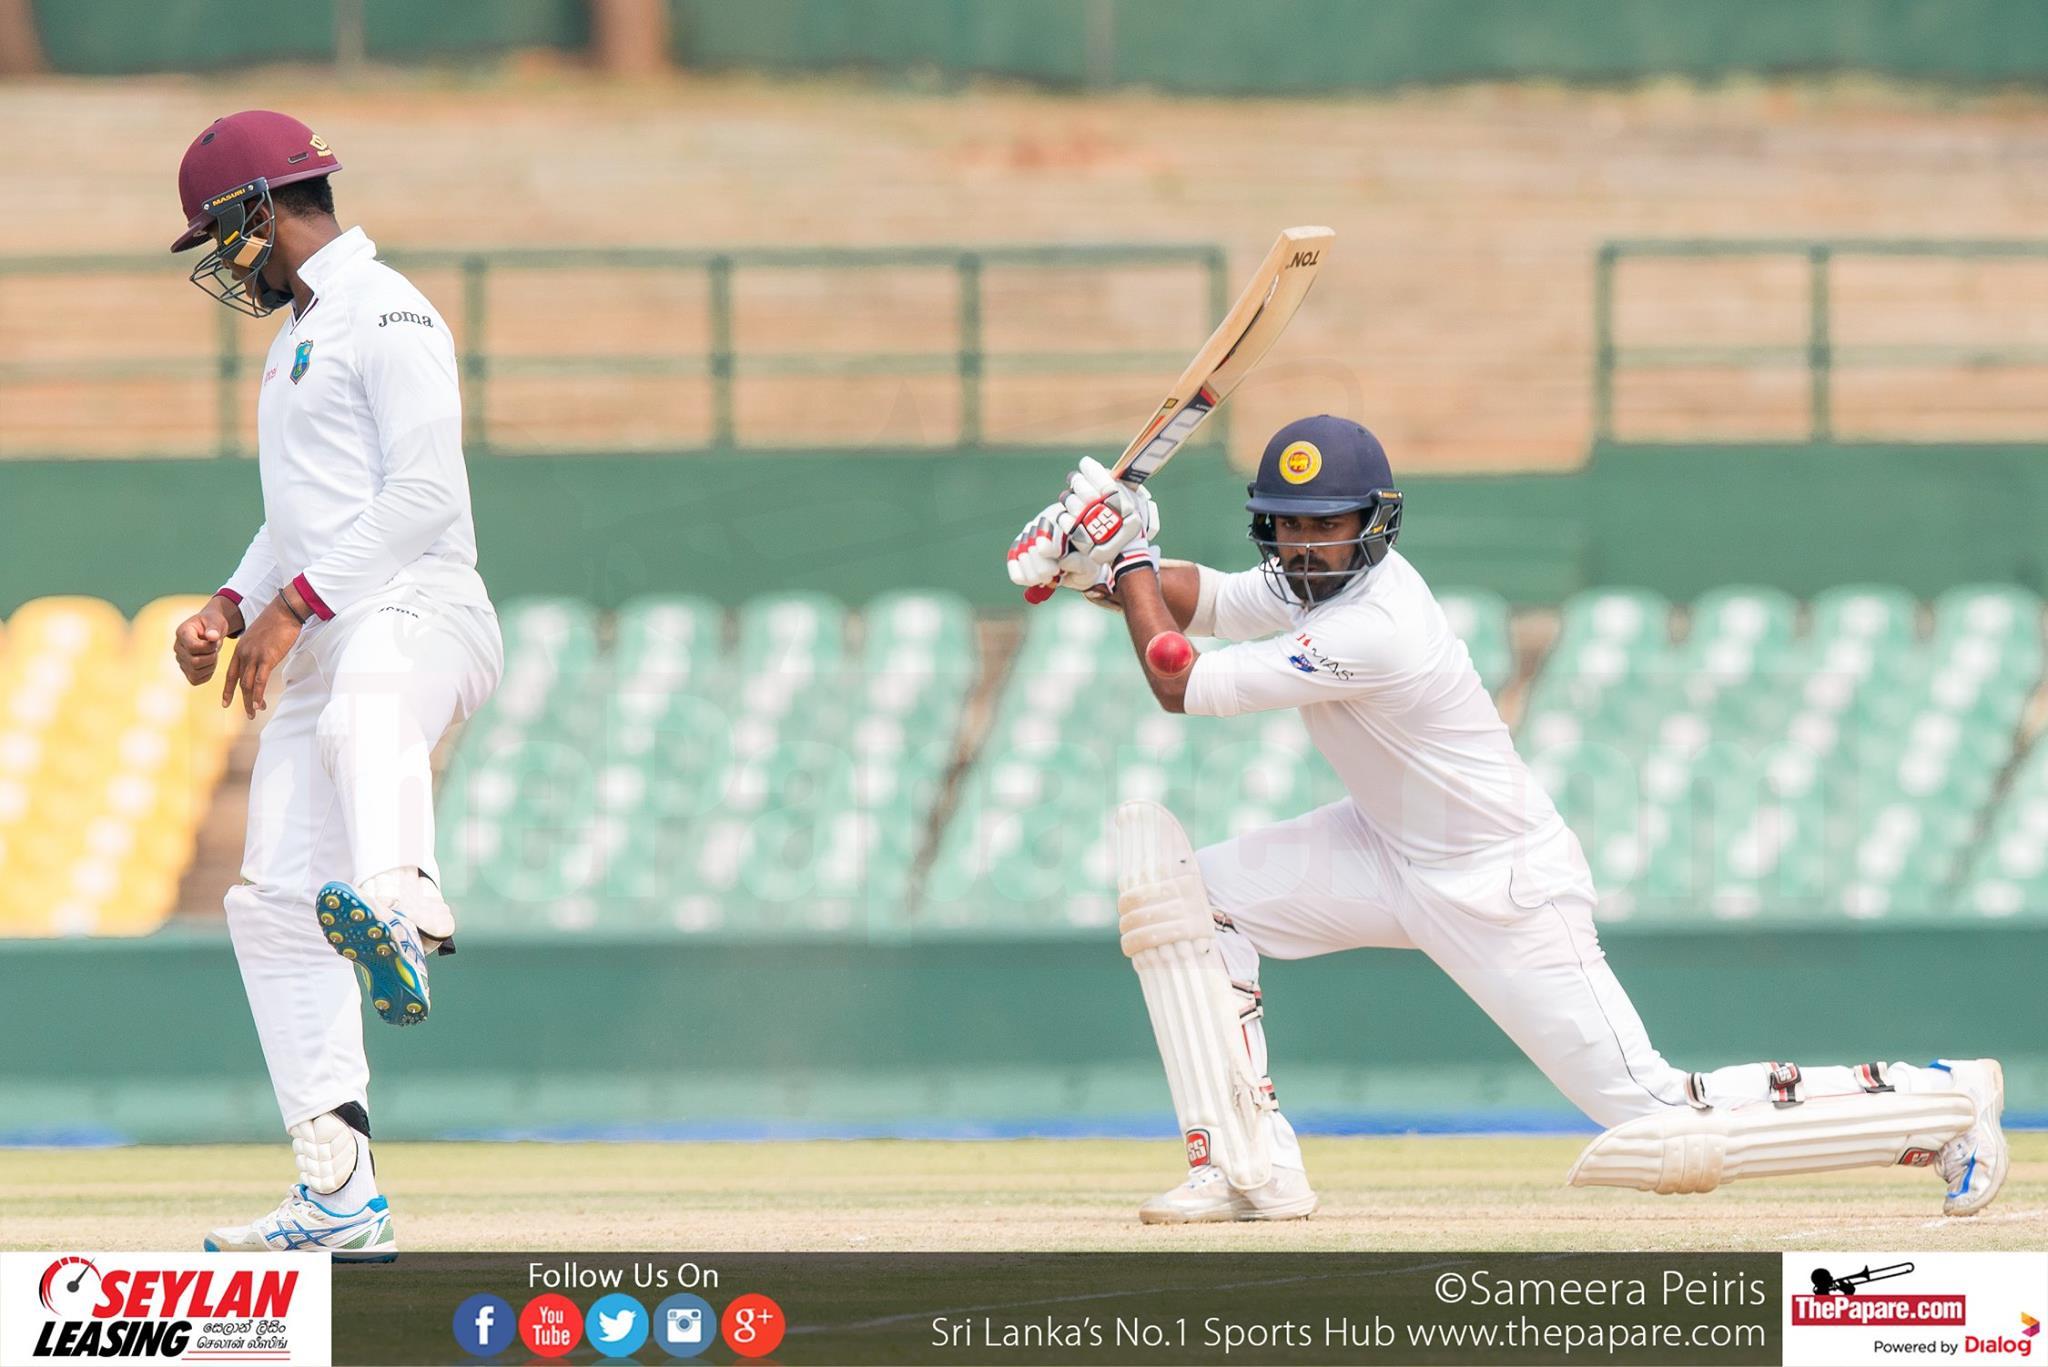 Sri Lanka 'A' vs West Indies 'A' - 3rd Test (Day 03)